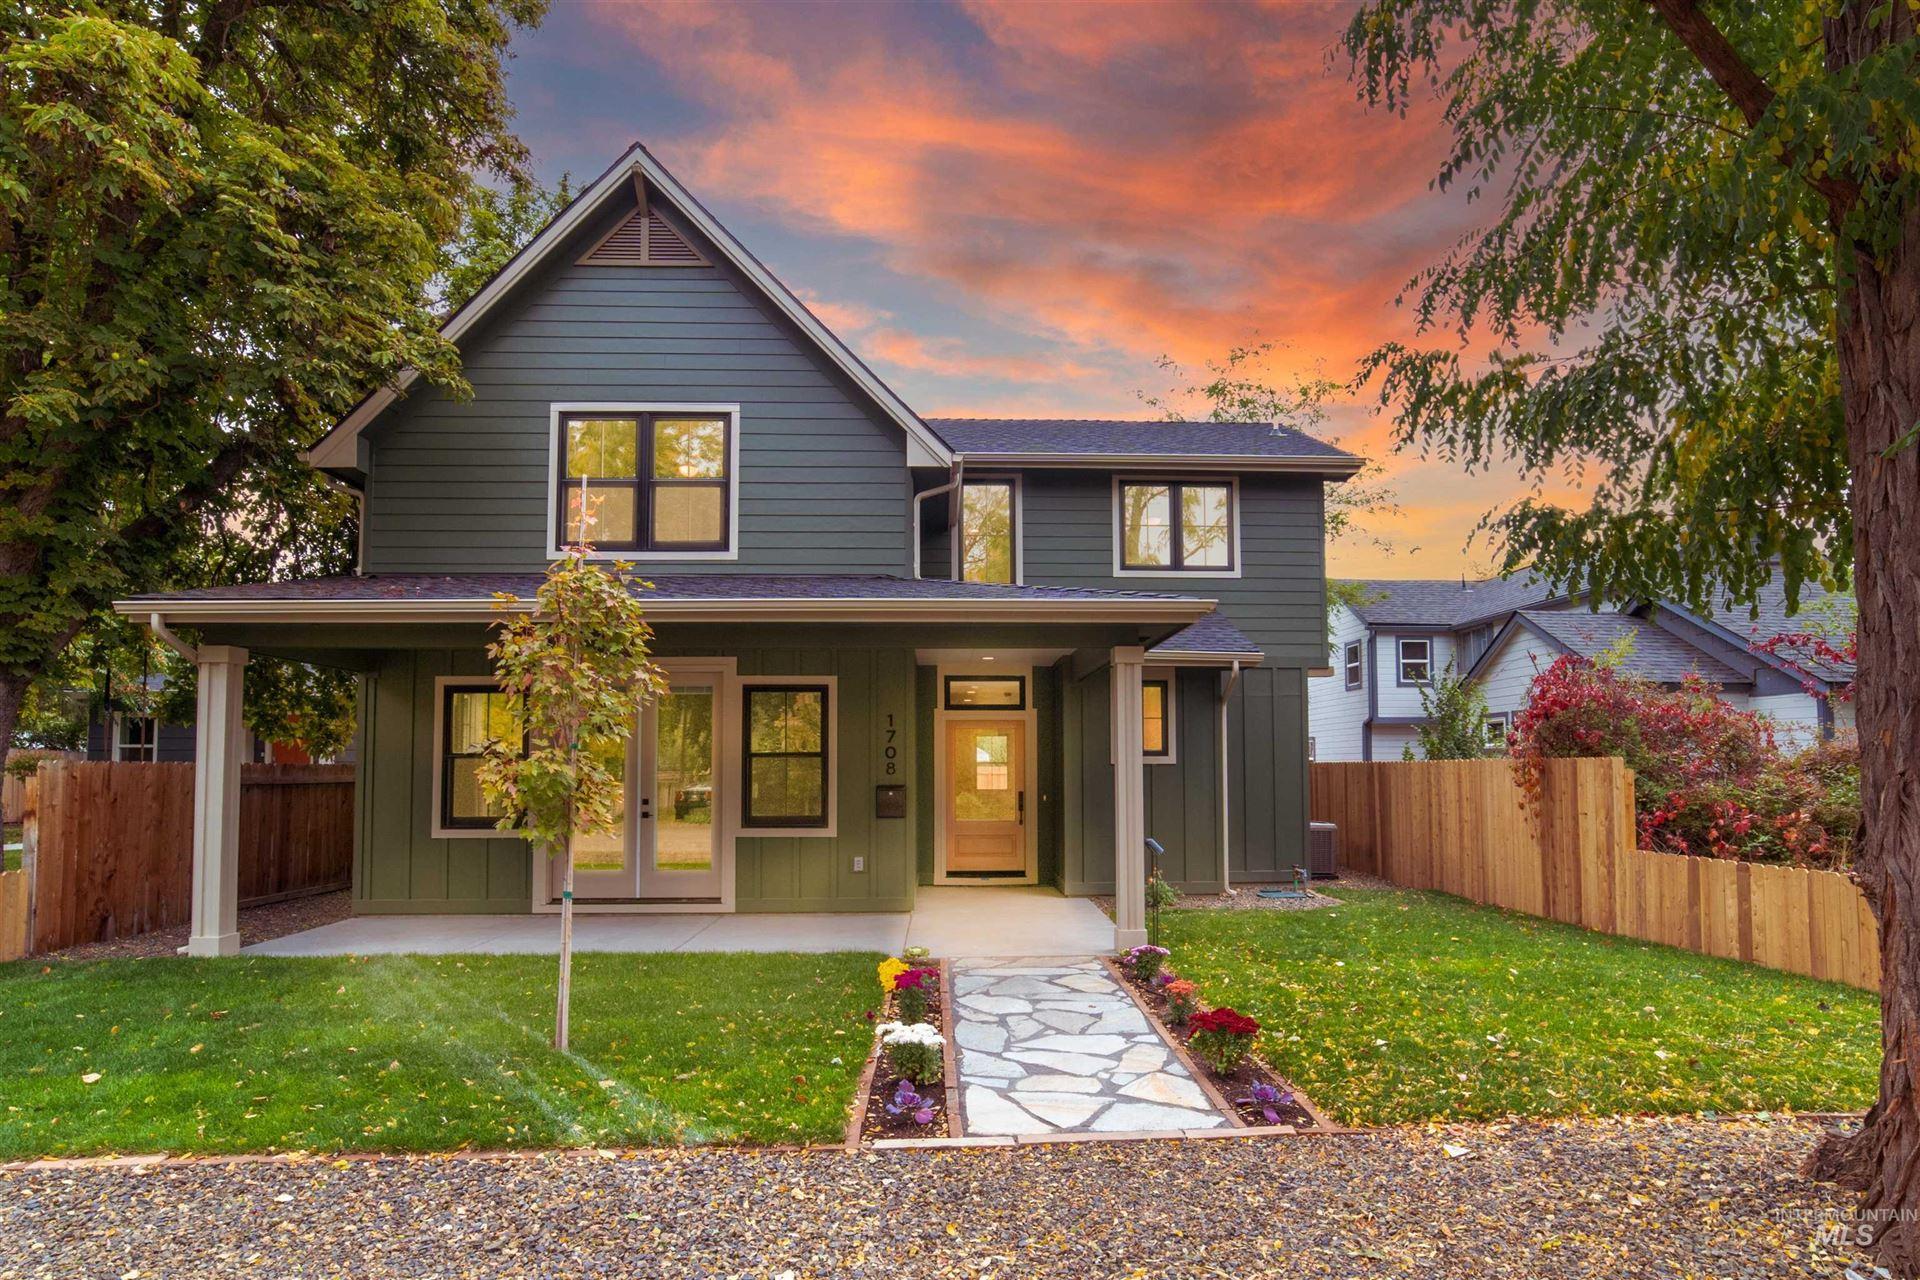 1708 N 27th Street, Boise, ID 83702 - MLS#: 98798200